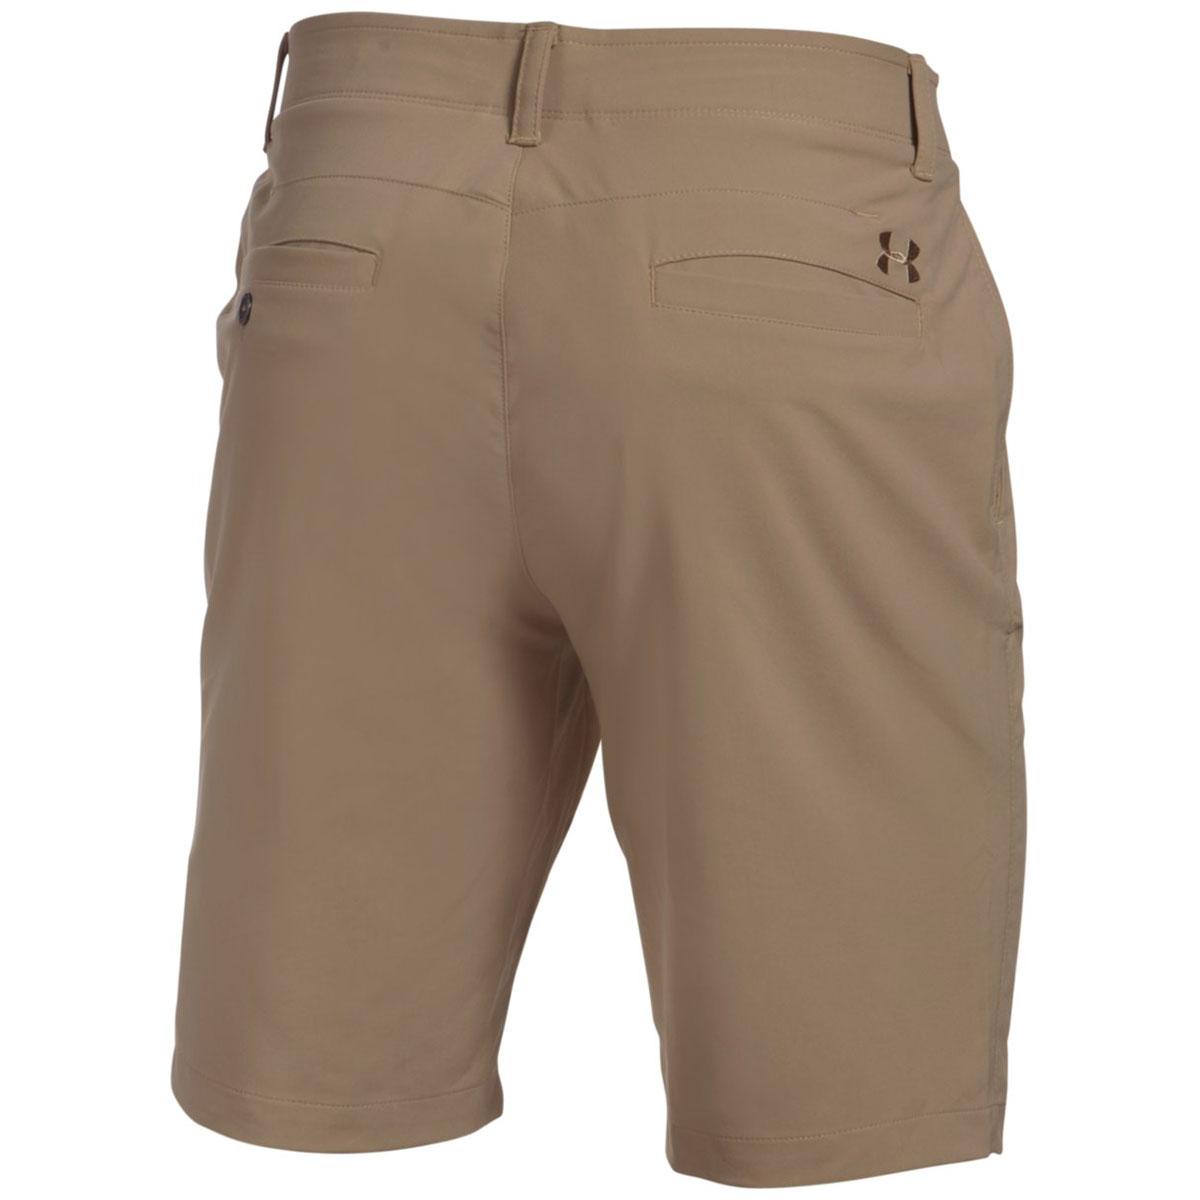 Under-Armour-Homme-UA-Match-Play-conique-Tech-Performance-Golf-Shorts-29-off-RRP miniature 11